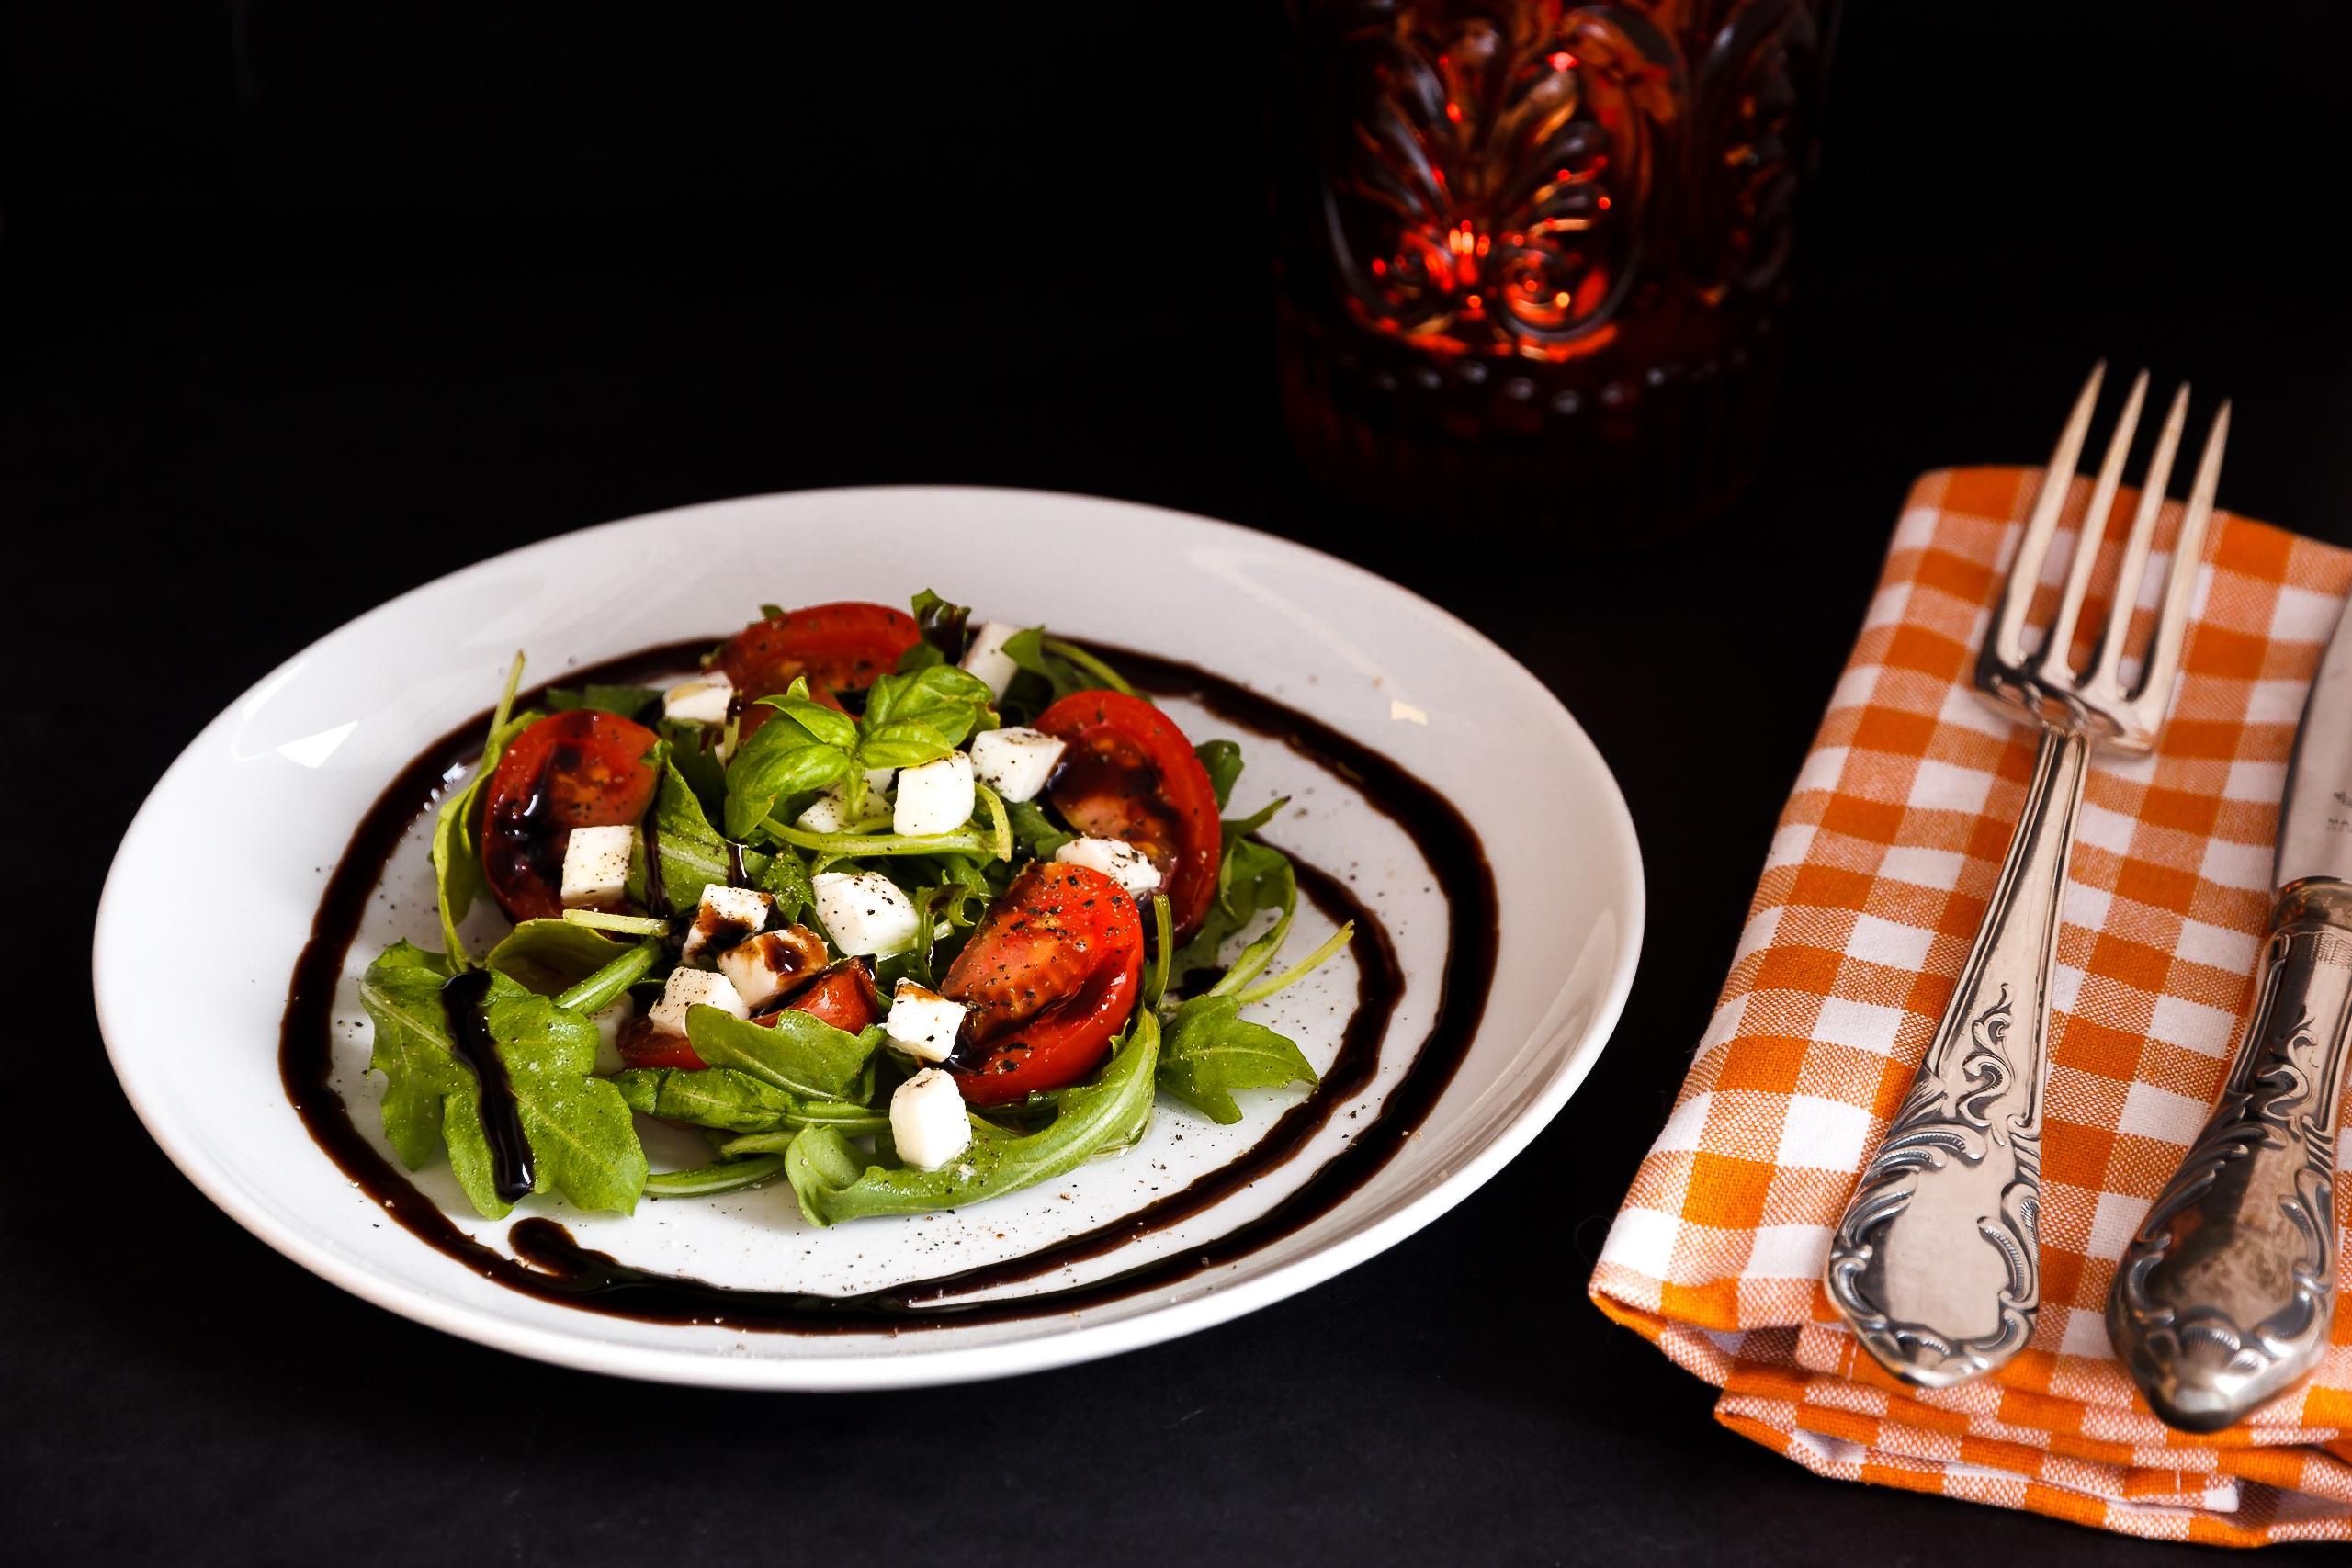 Free Images Table Fork Cutlery Board Restaurant Rustic Dish Meal Food Produce Vegetable Plate Breakfast Healthy Eat Cuisine Tableware